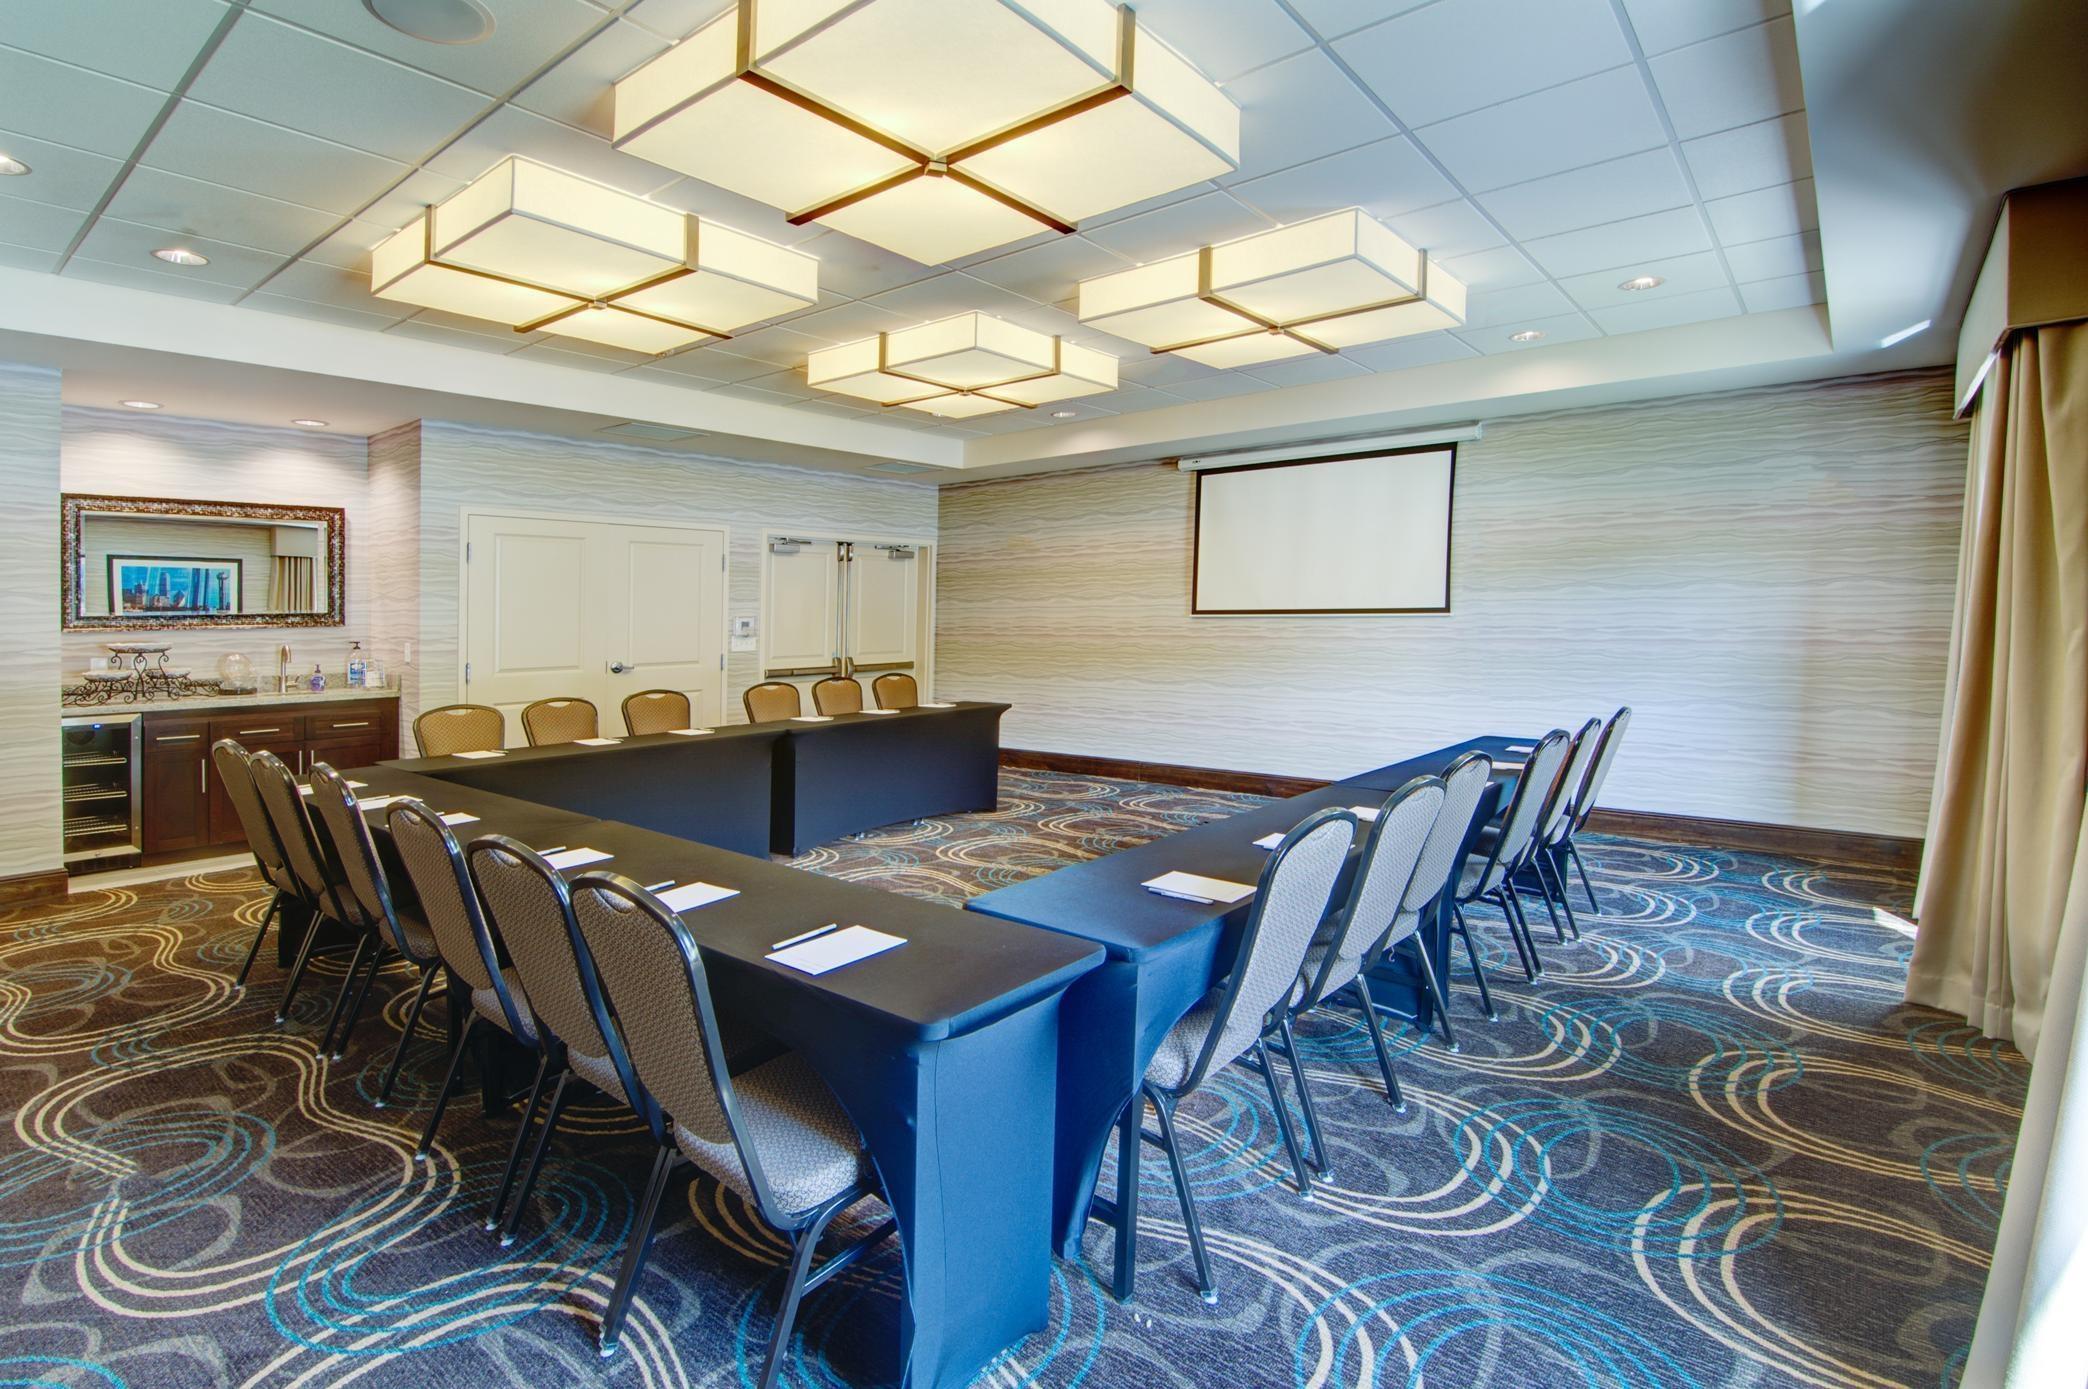 Hampton Inn & Suites Trophy Club - Fort Worth North image 14